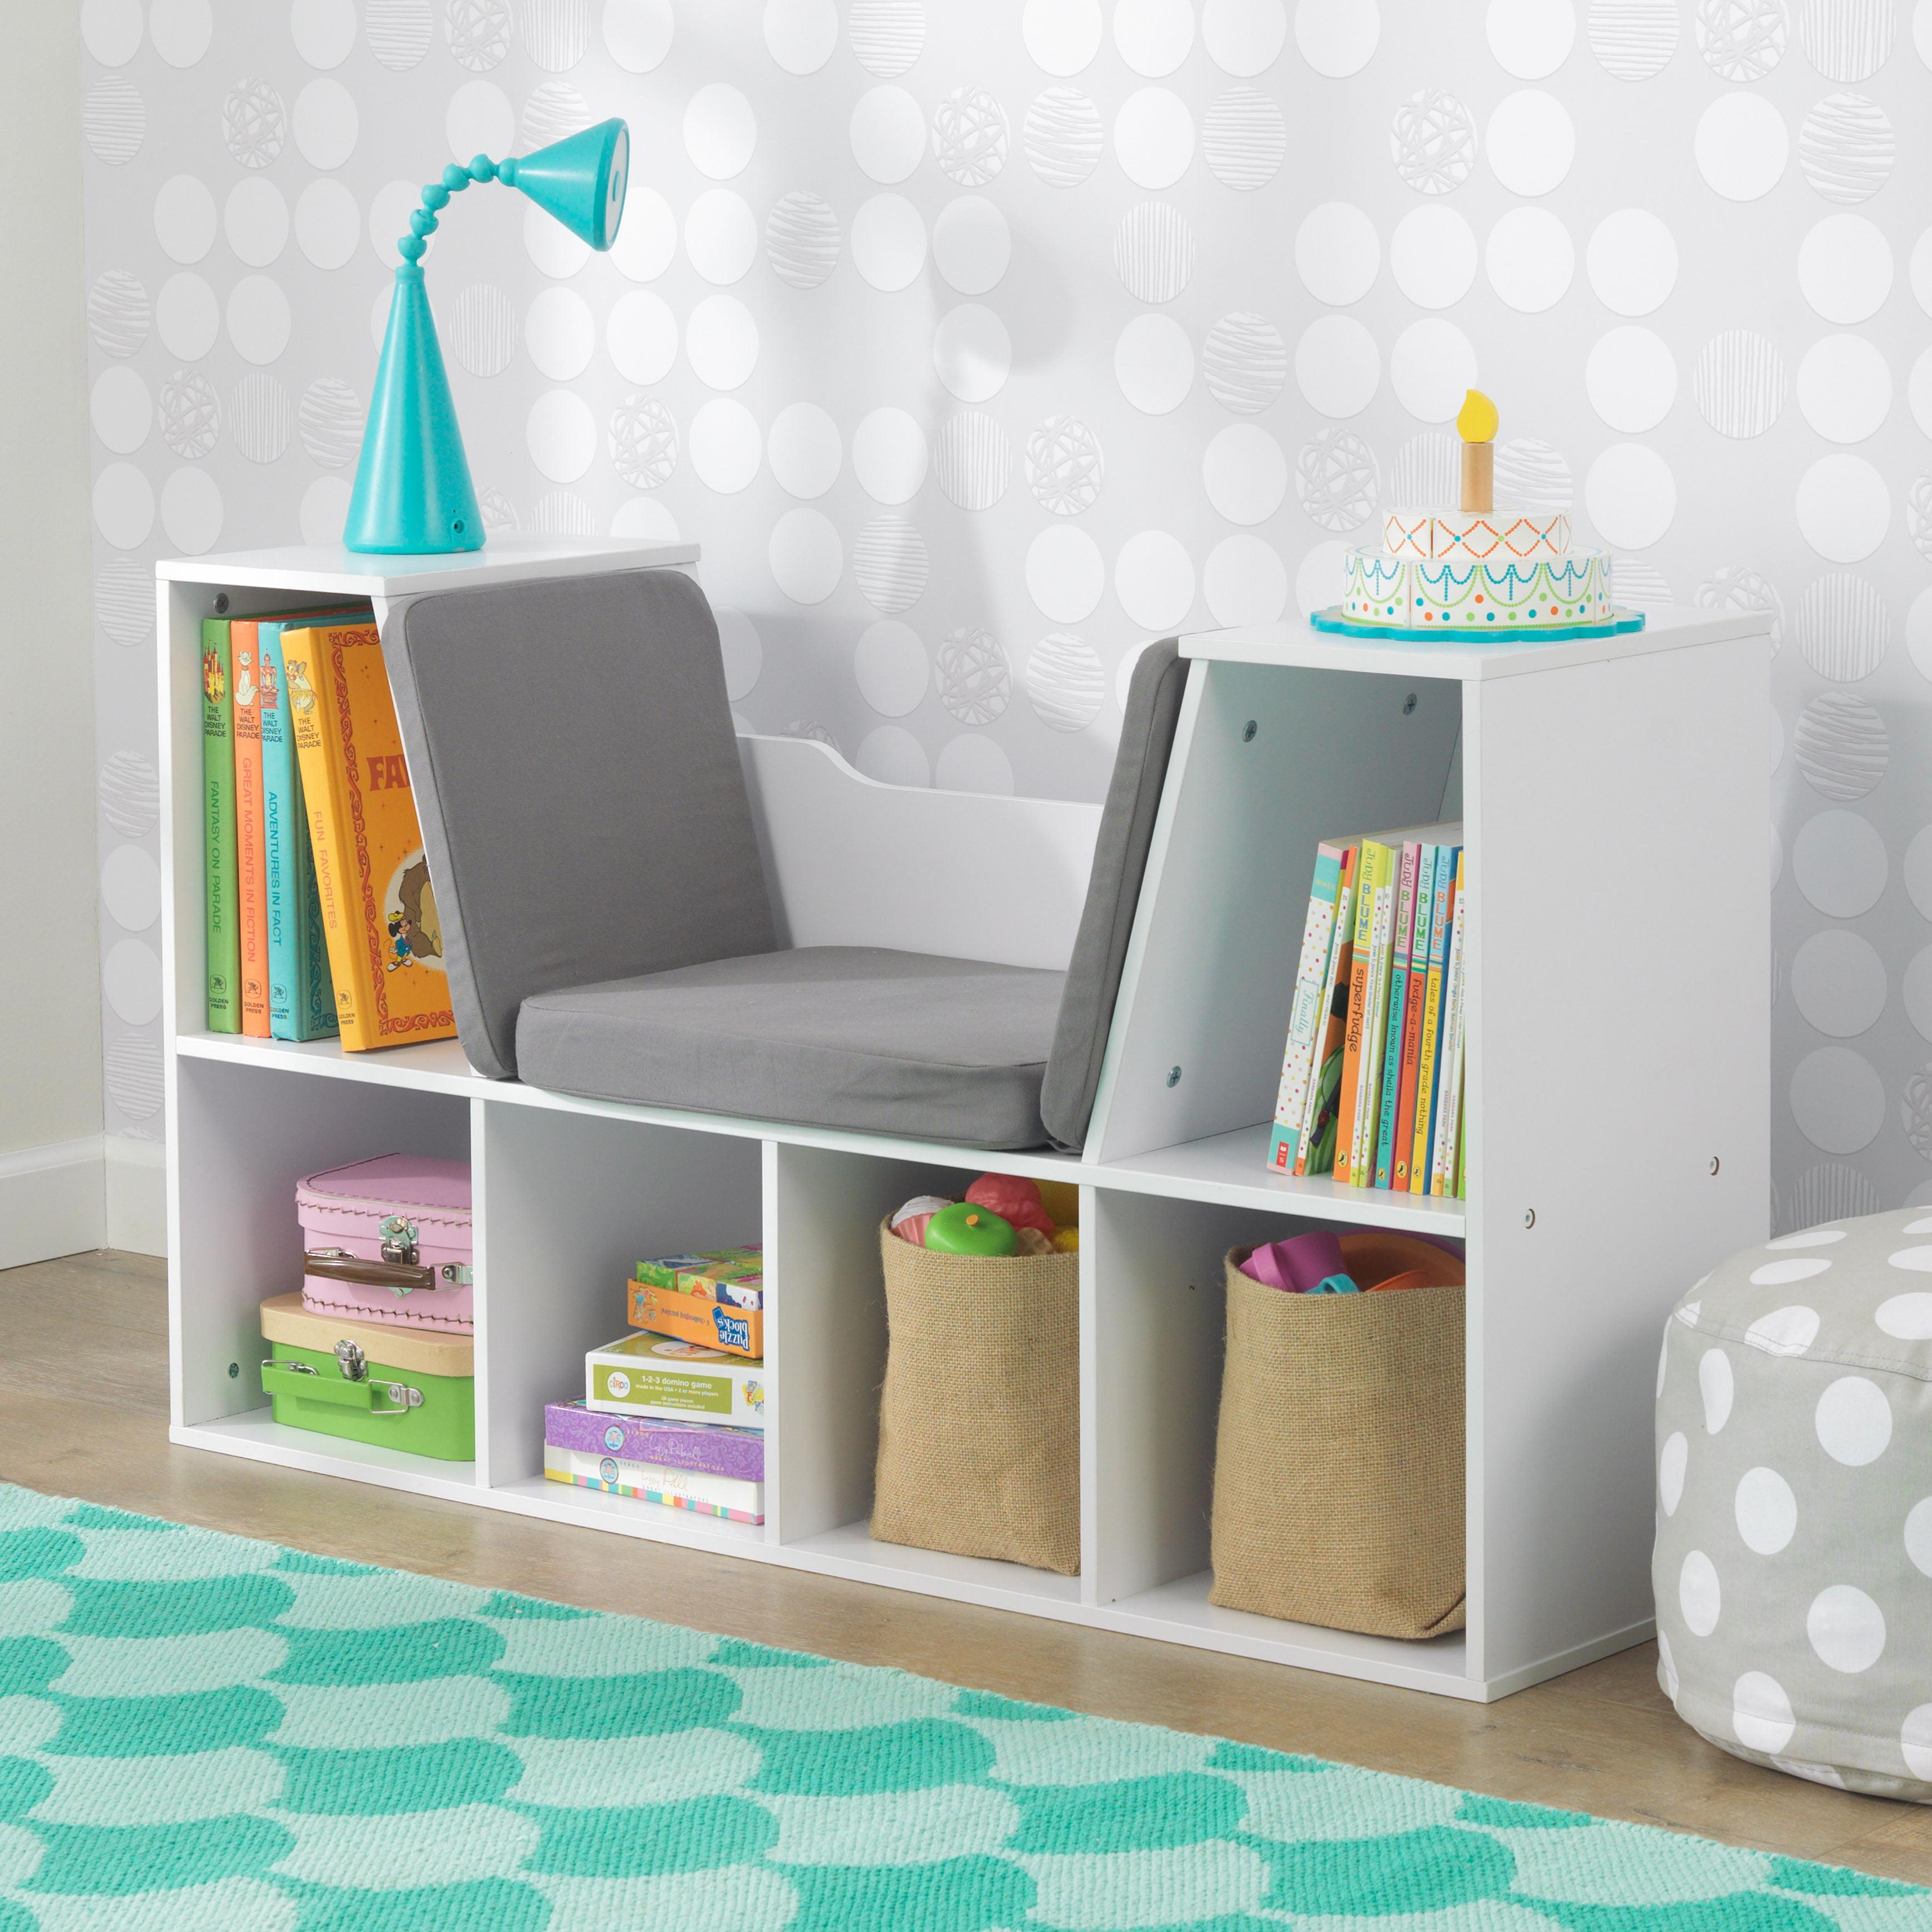 KidKraft Kids Bookshelf with Reading Nook, Multiple Colors